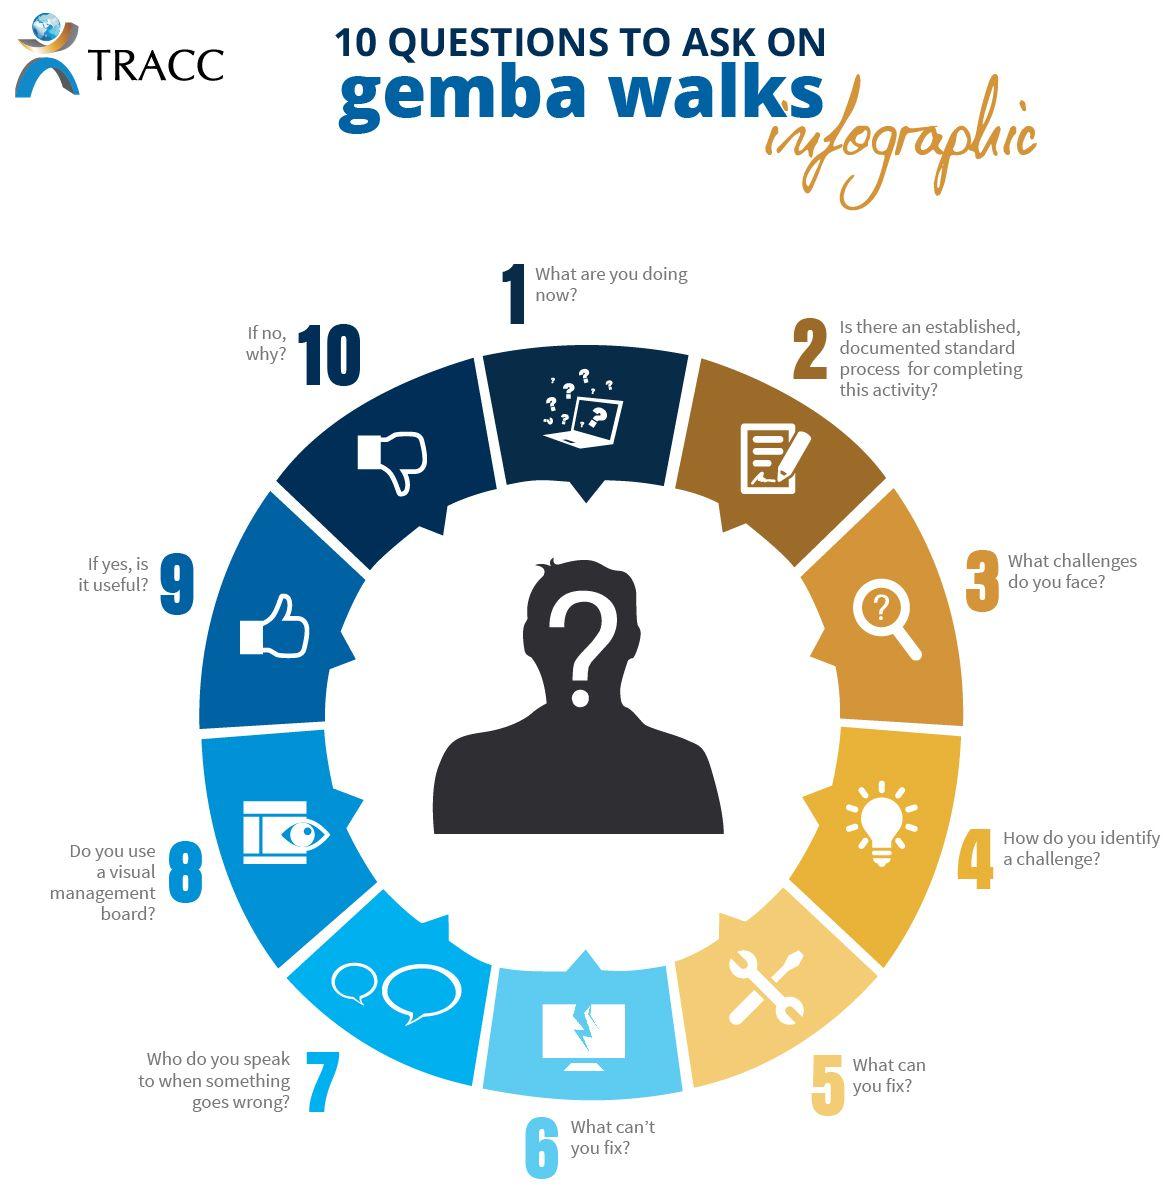 gemba walk checklist - Recherche Google | Amélioration continue ...